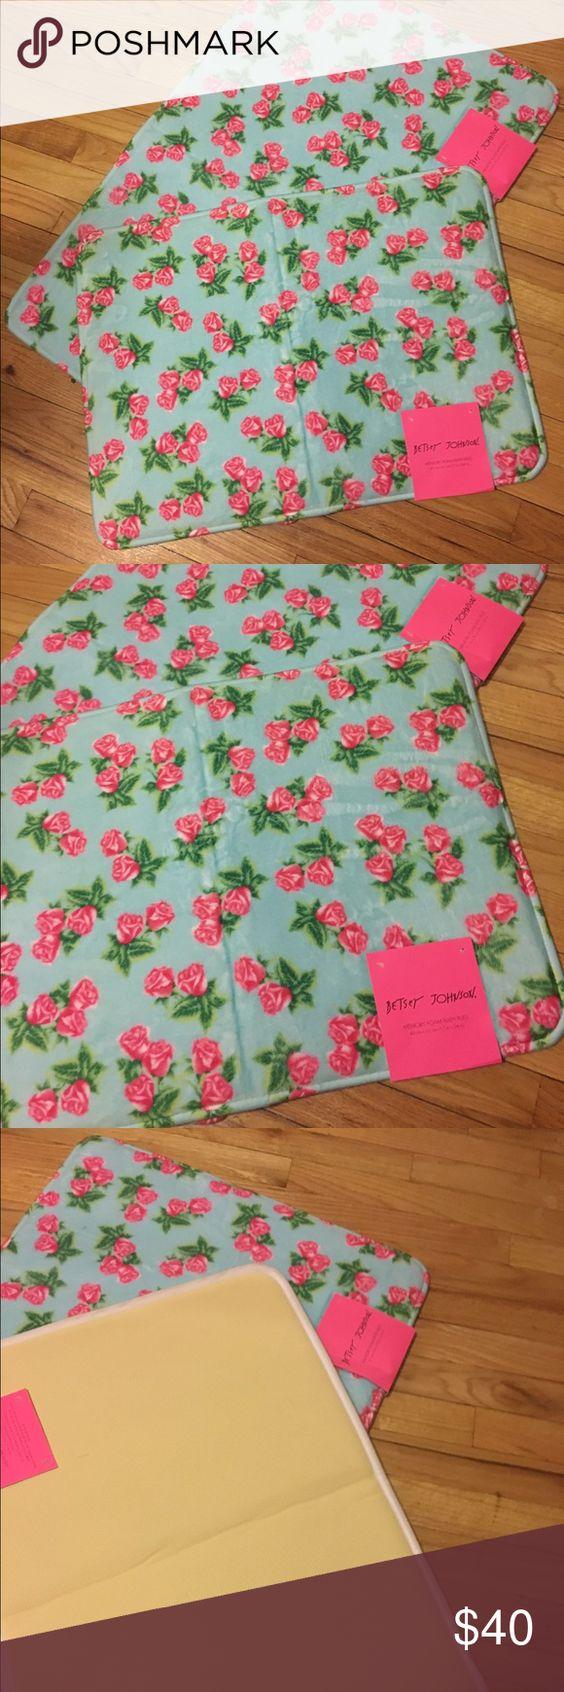 Betsy Johnson bath rug set New never used Betsey Johnson Other